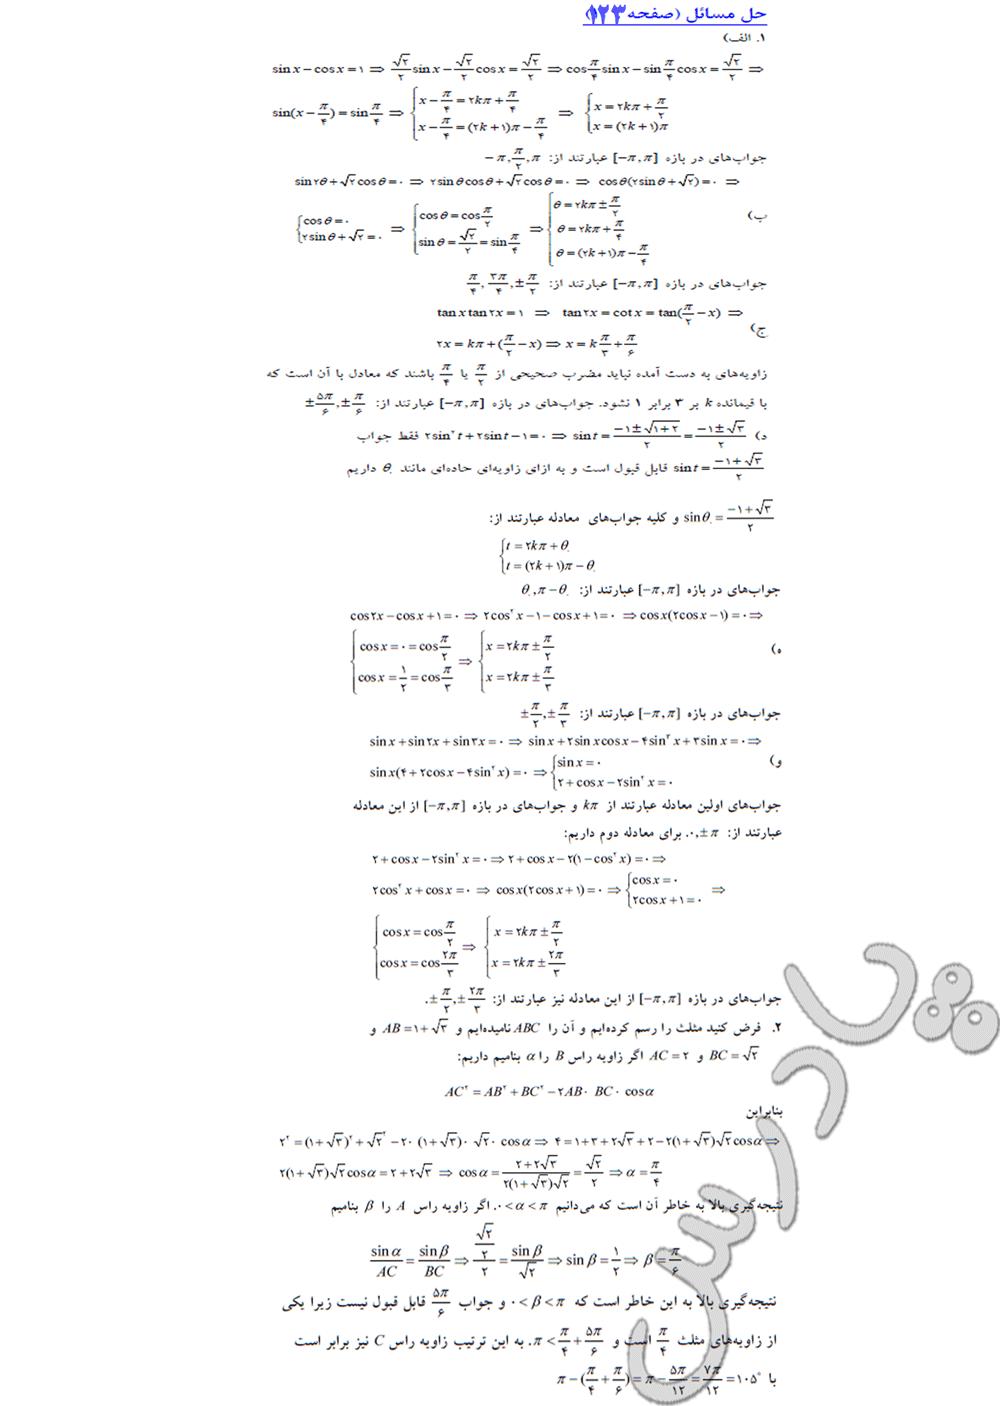 حل مسائل صفحه 123 حسابان سوم ریاضی